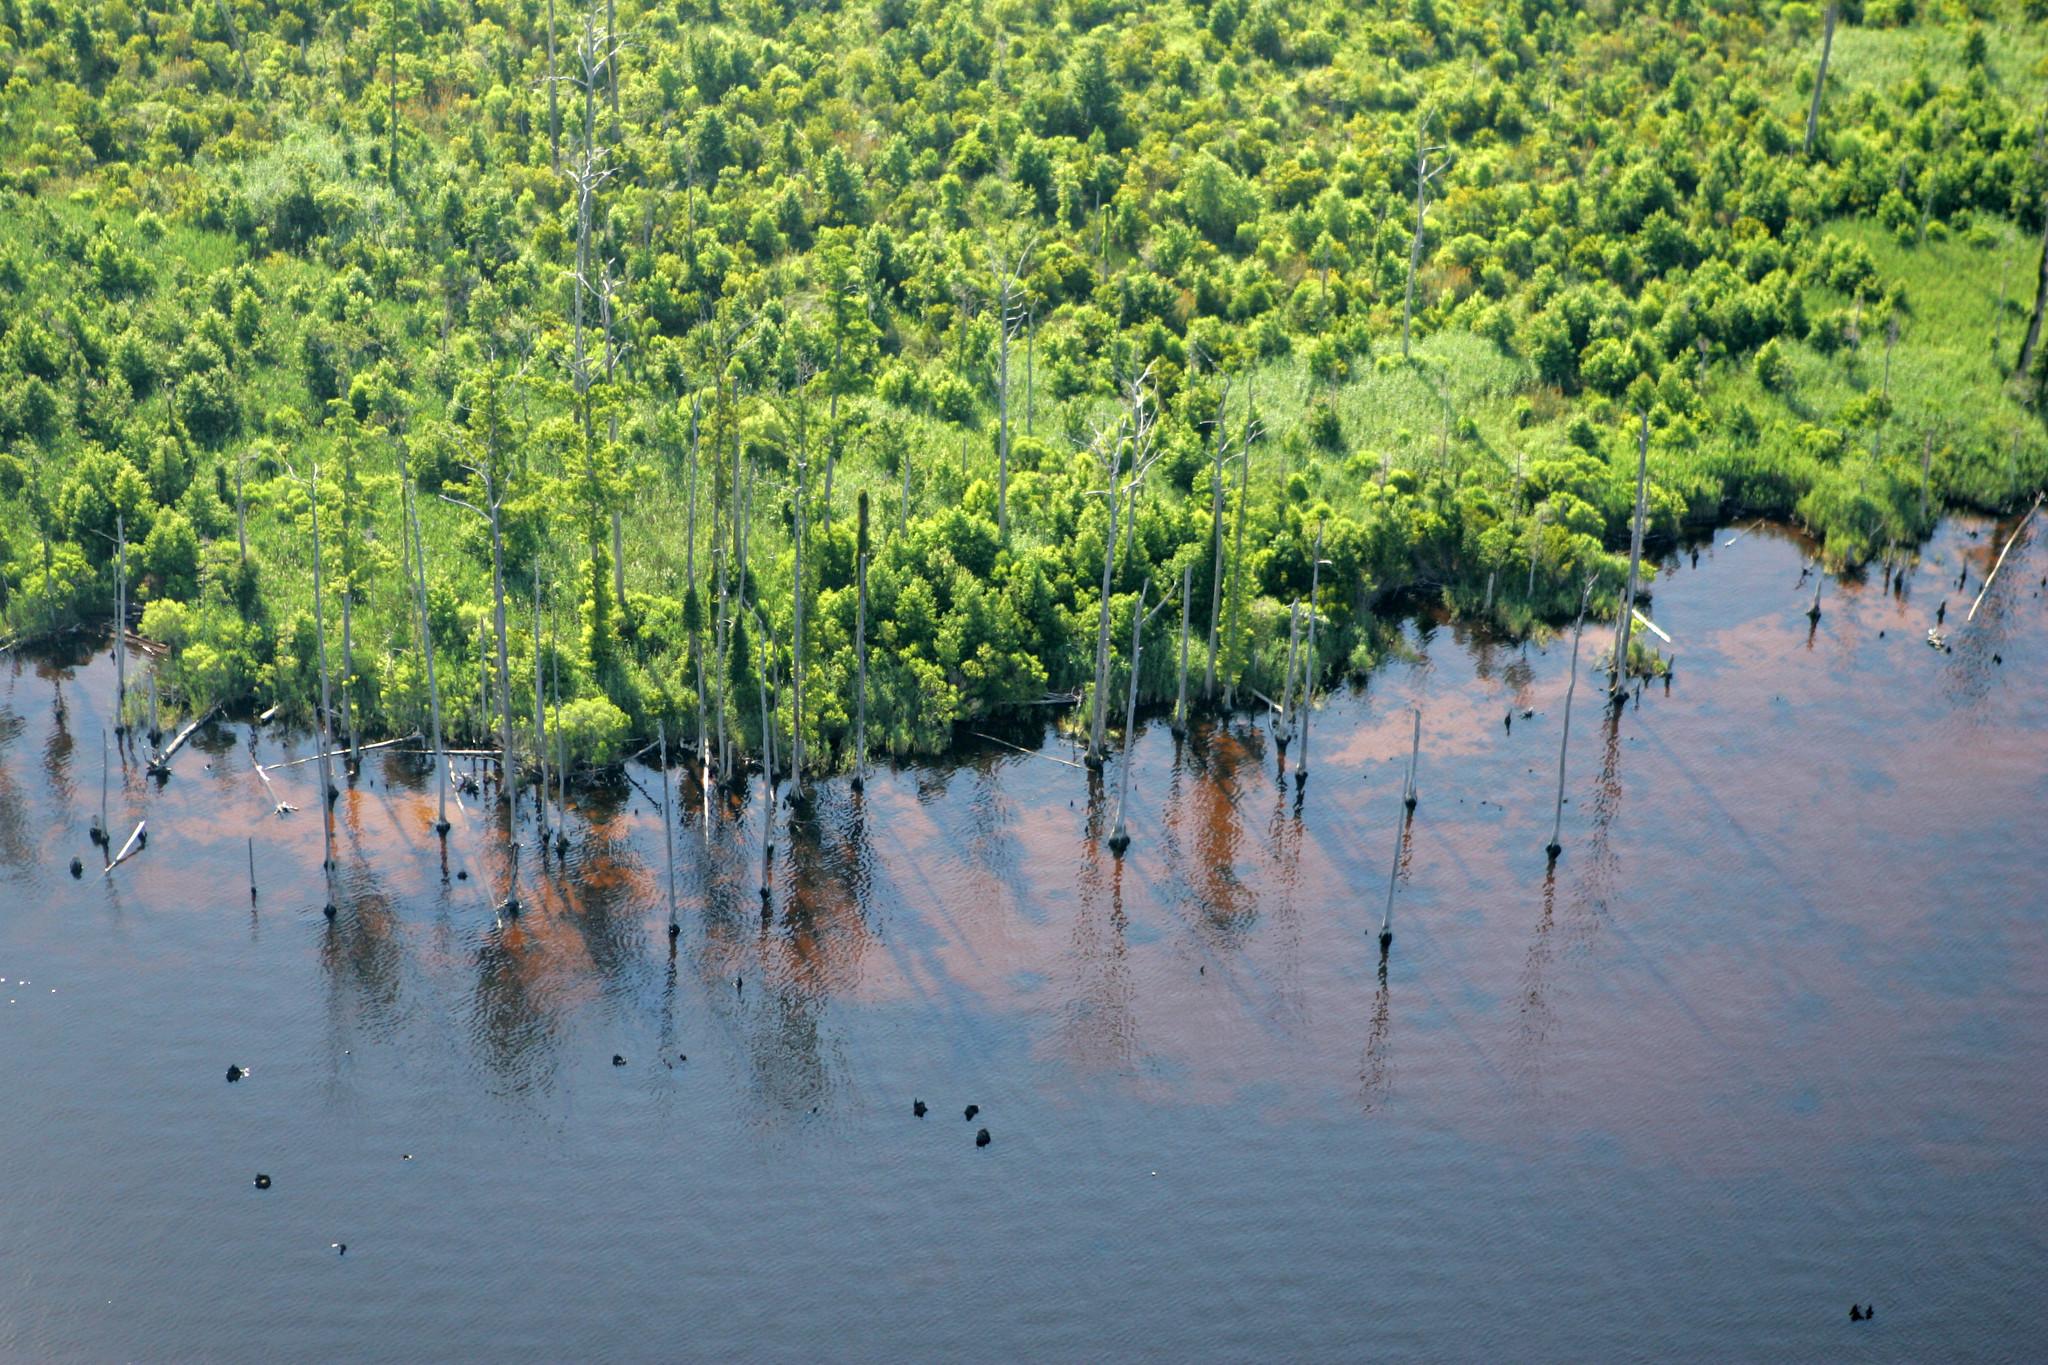 EPA revives climate change website, adds 'indicators' data - Coastal Review Online